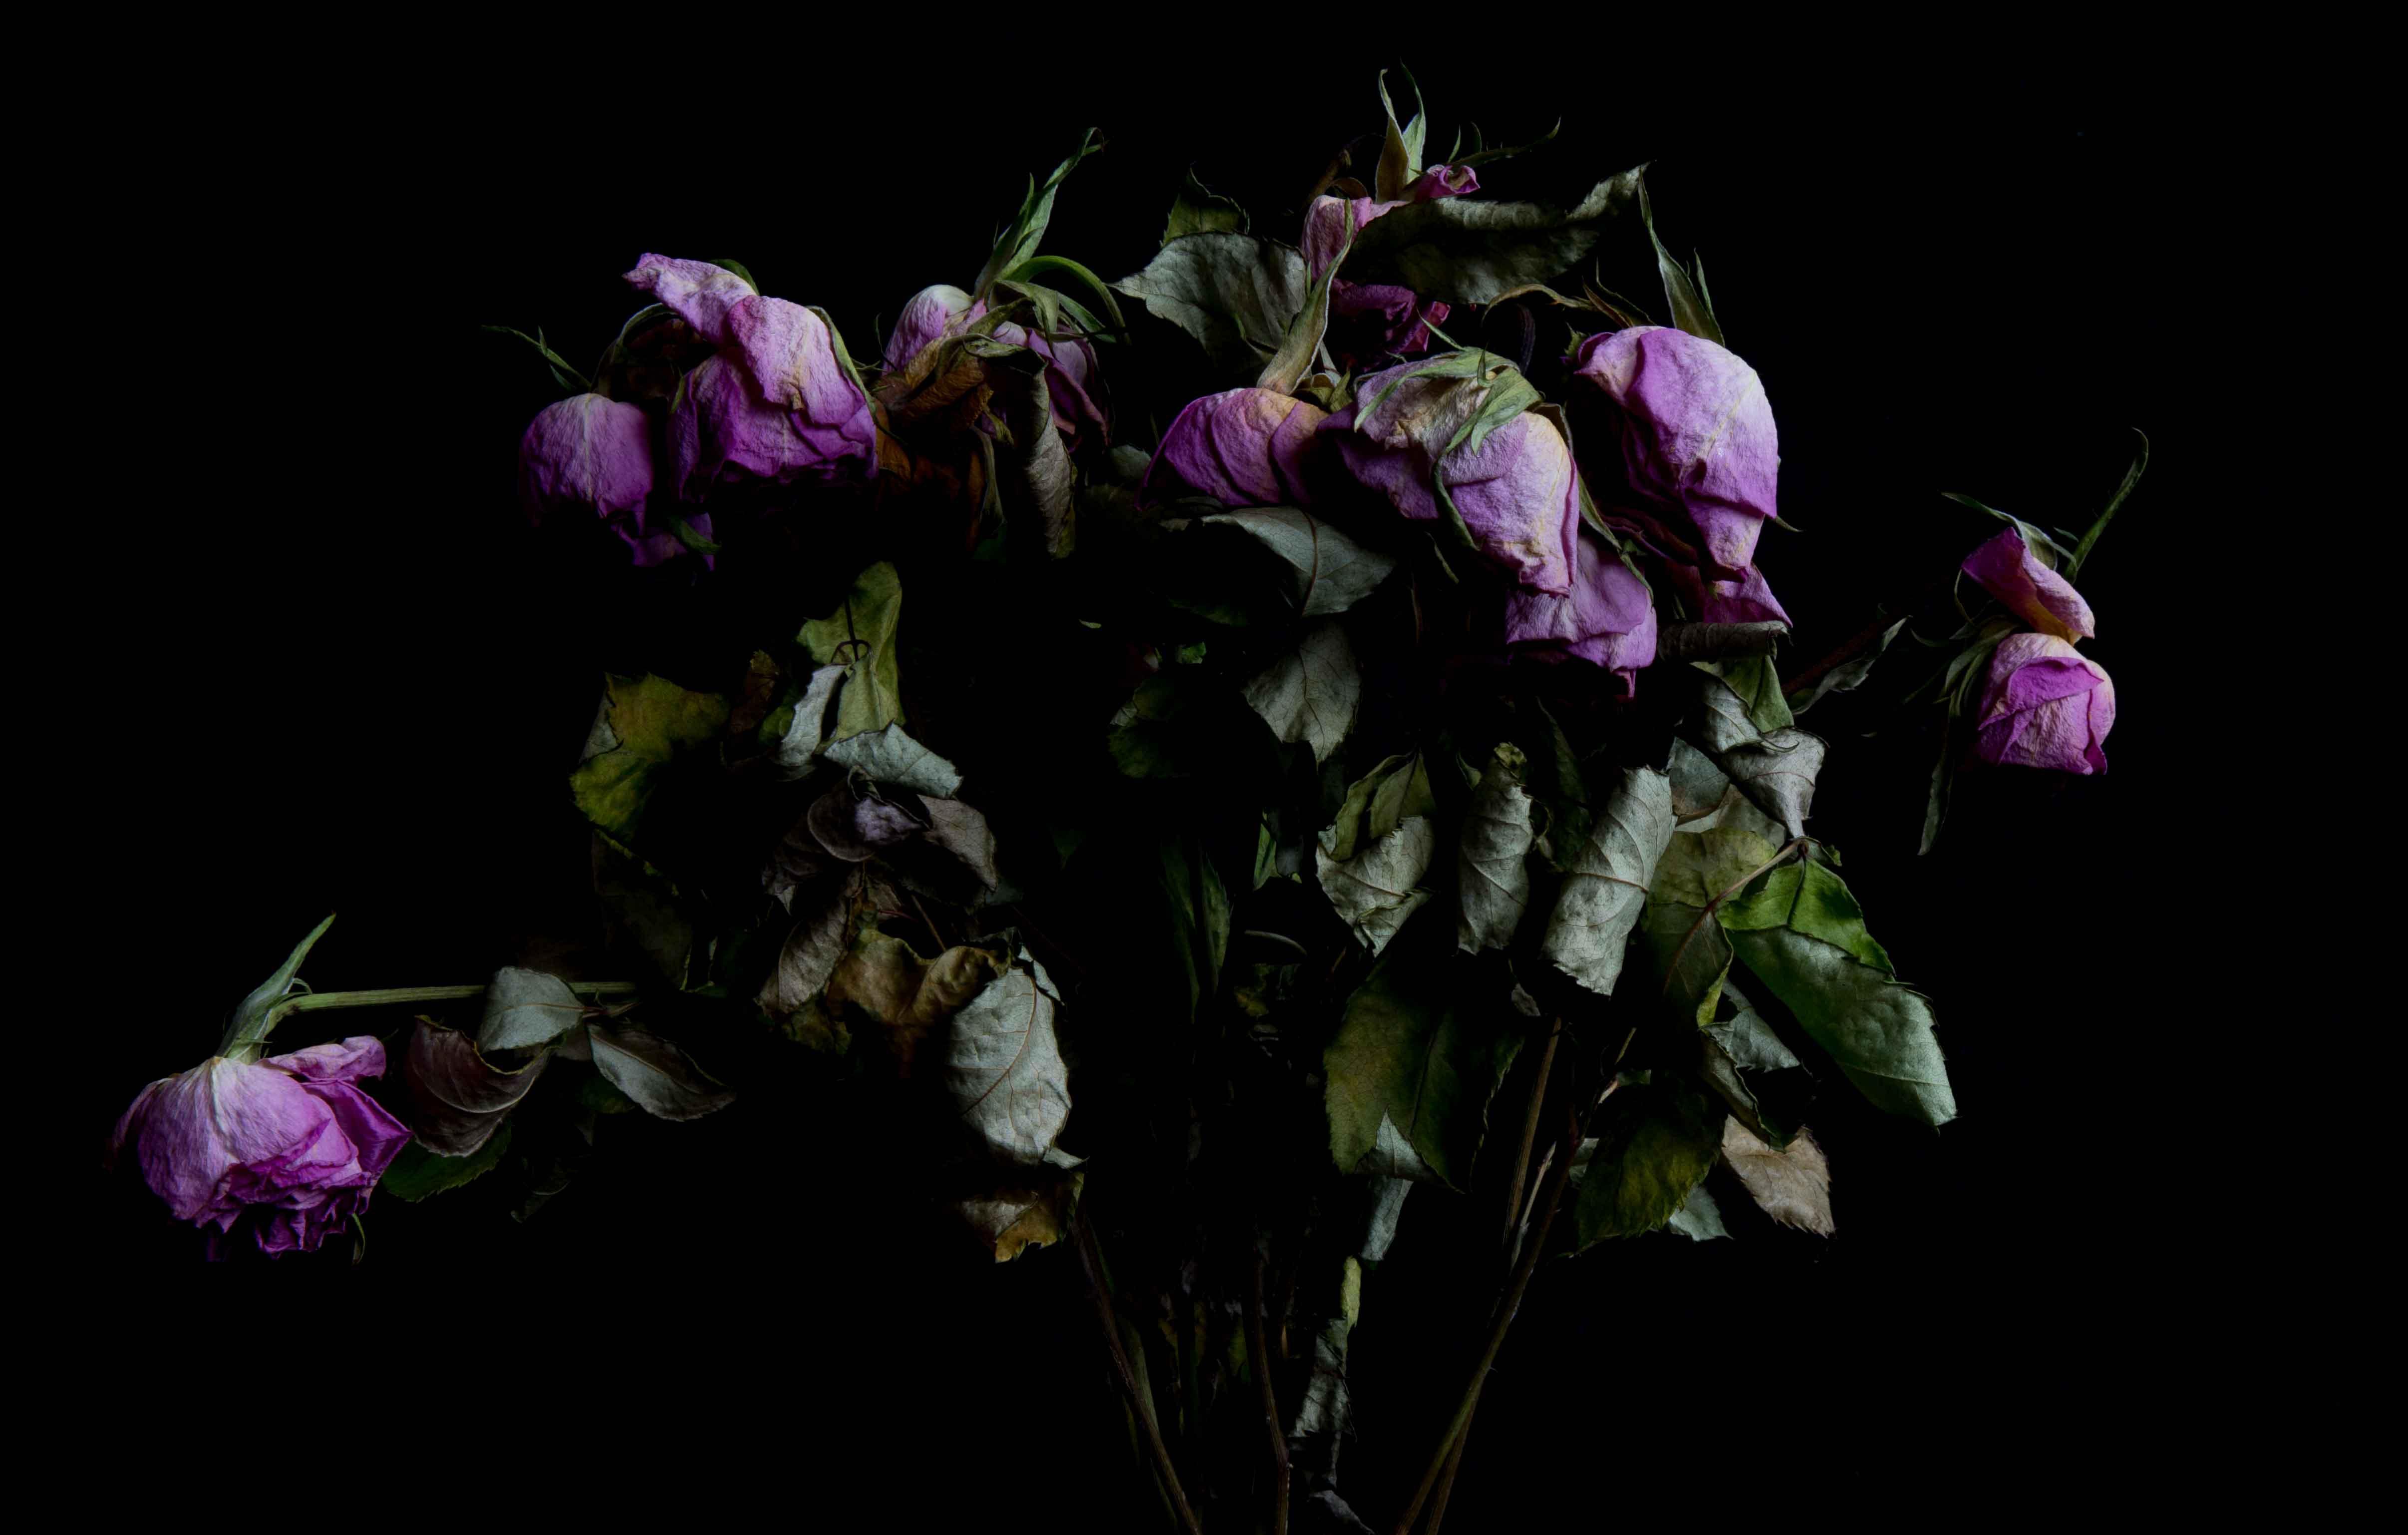 Roses - November 2017